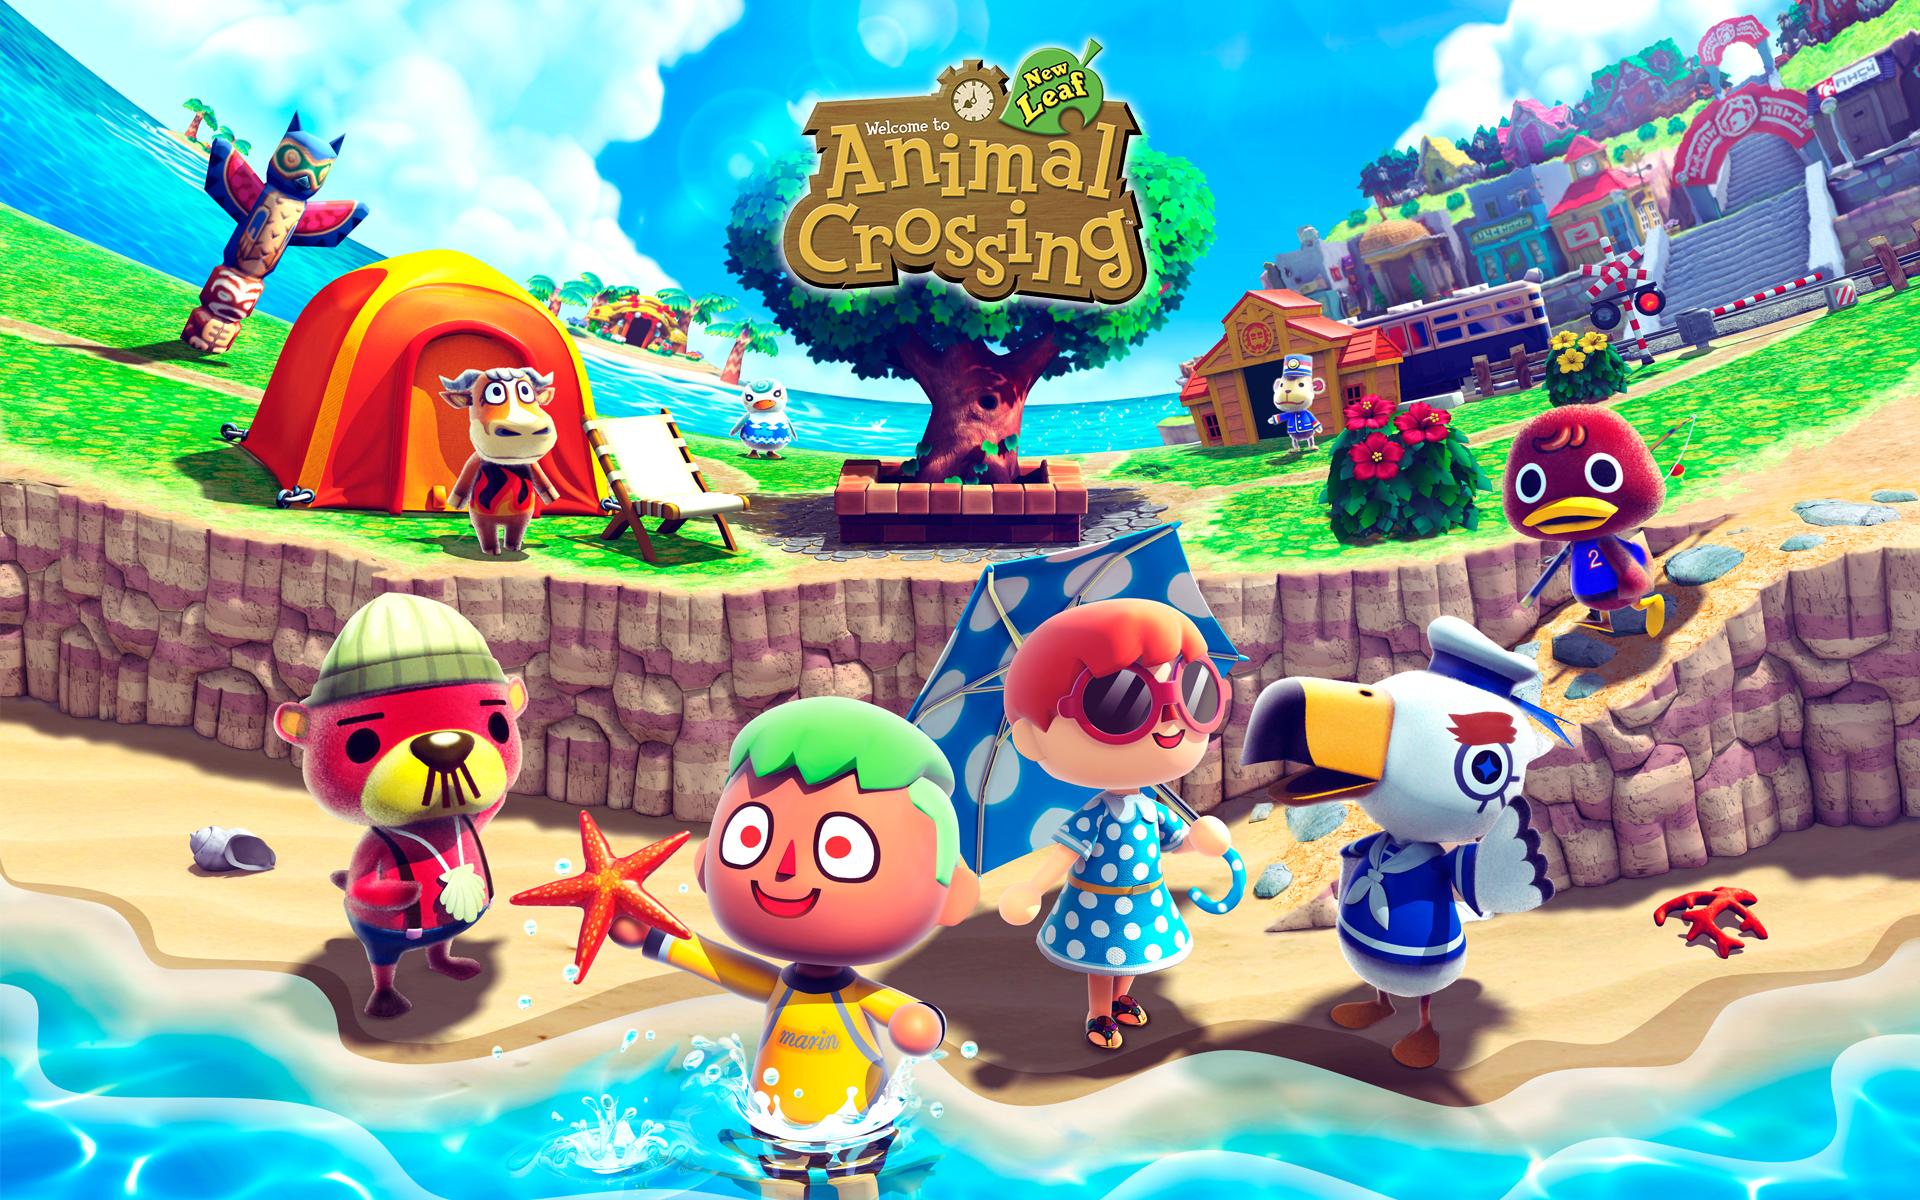 August Nintendo Direct: Animal Crossing Plaza announced